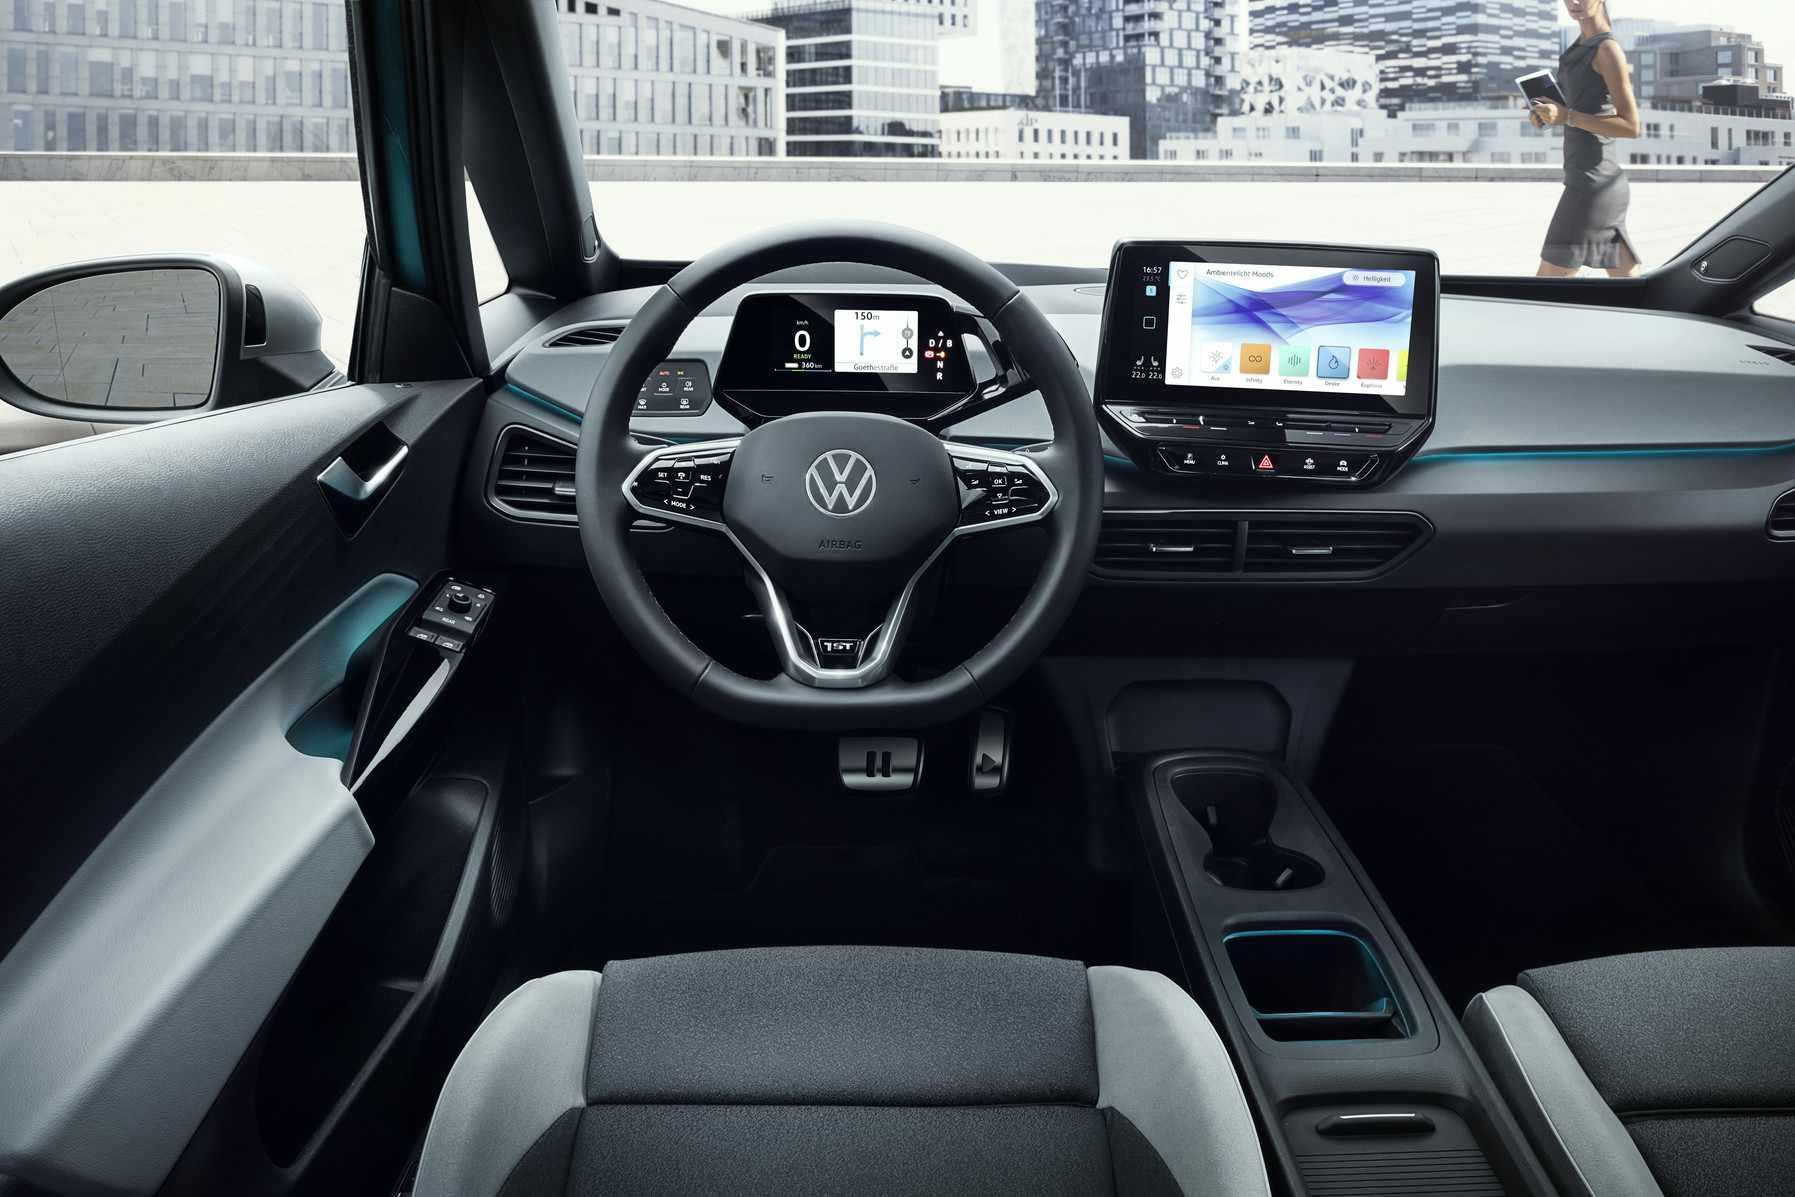 Interior of VW